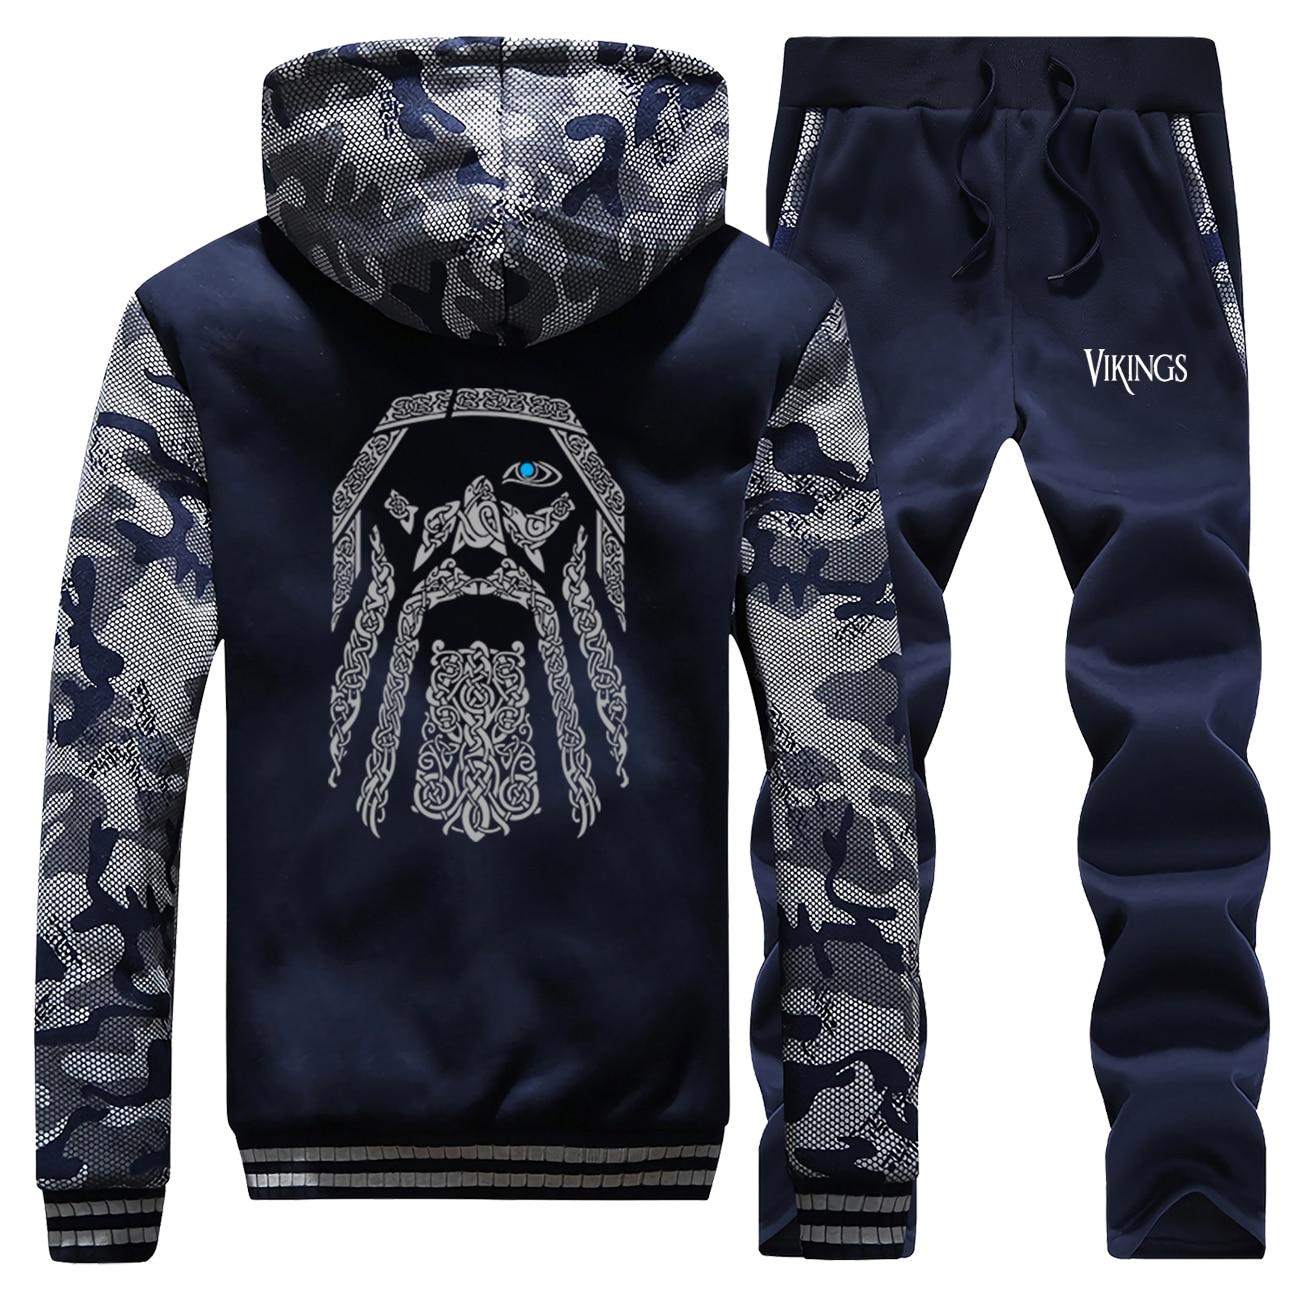 Odin Vikings Thick Hoodies Men Warm Suit Jacket+Pant 2PC Sets Male Winter Sweatshirt Camouflage Coat Mens Fashion Sportswear